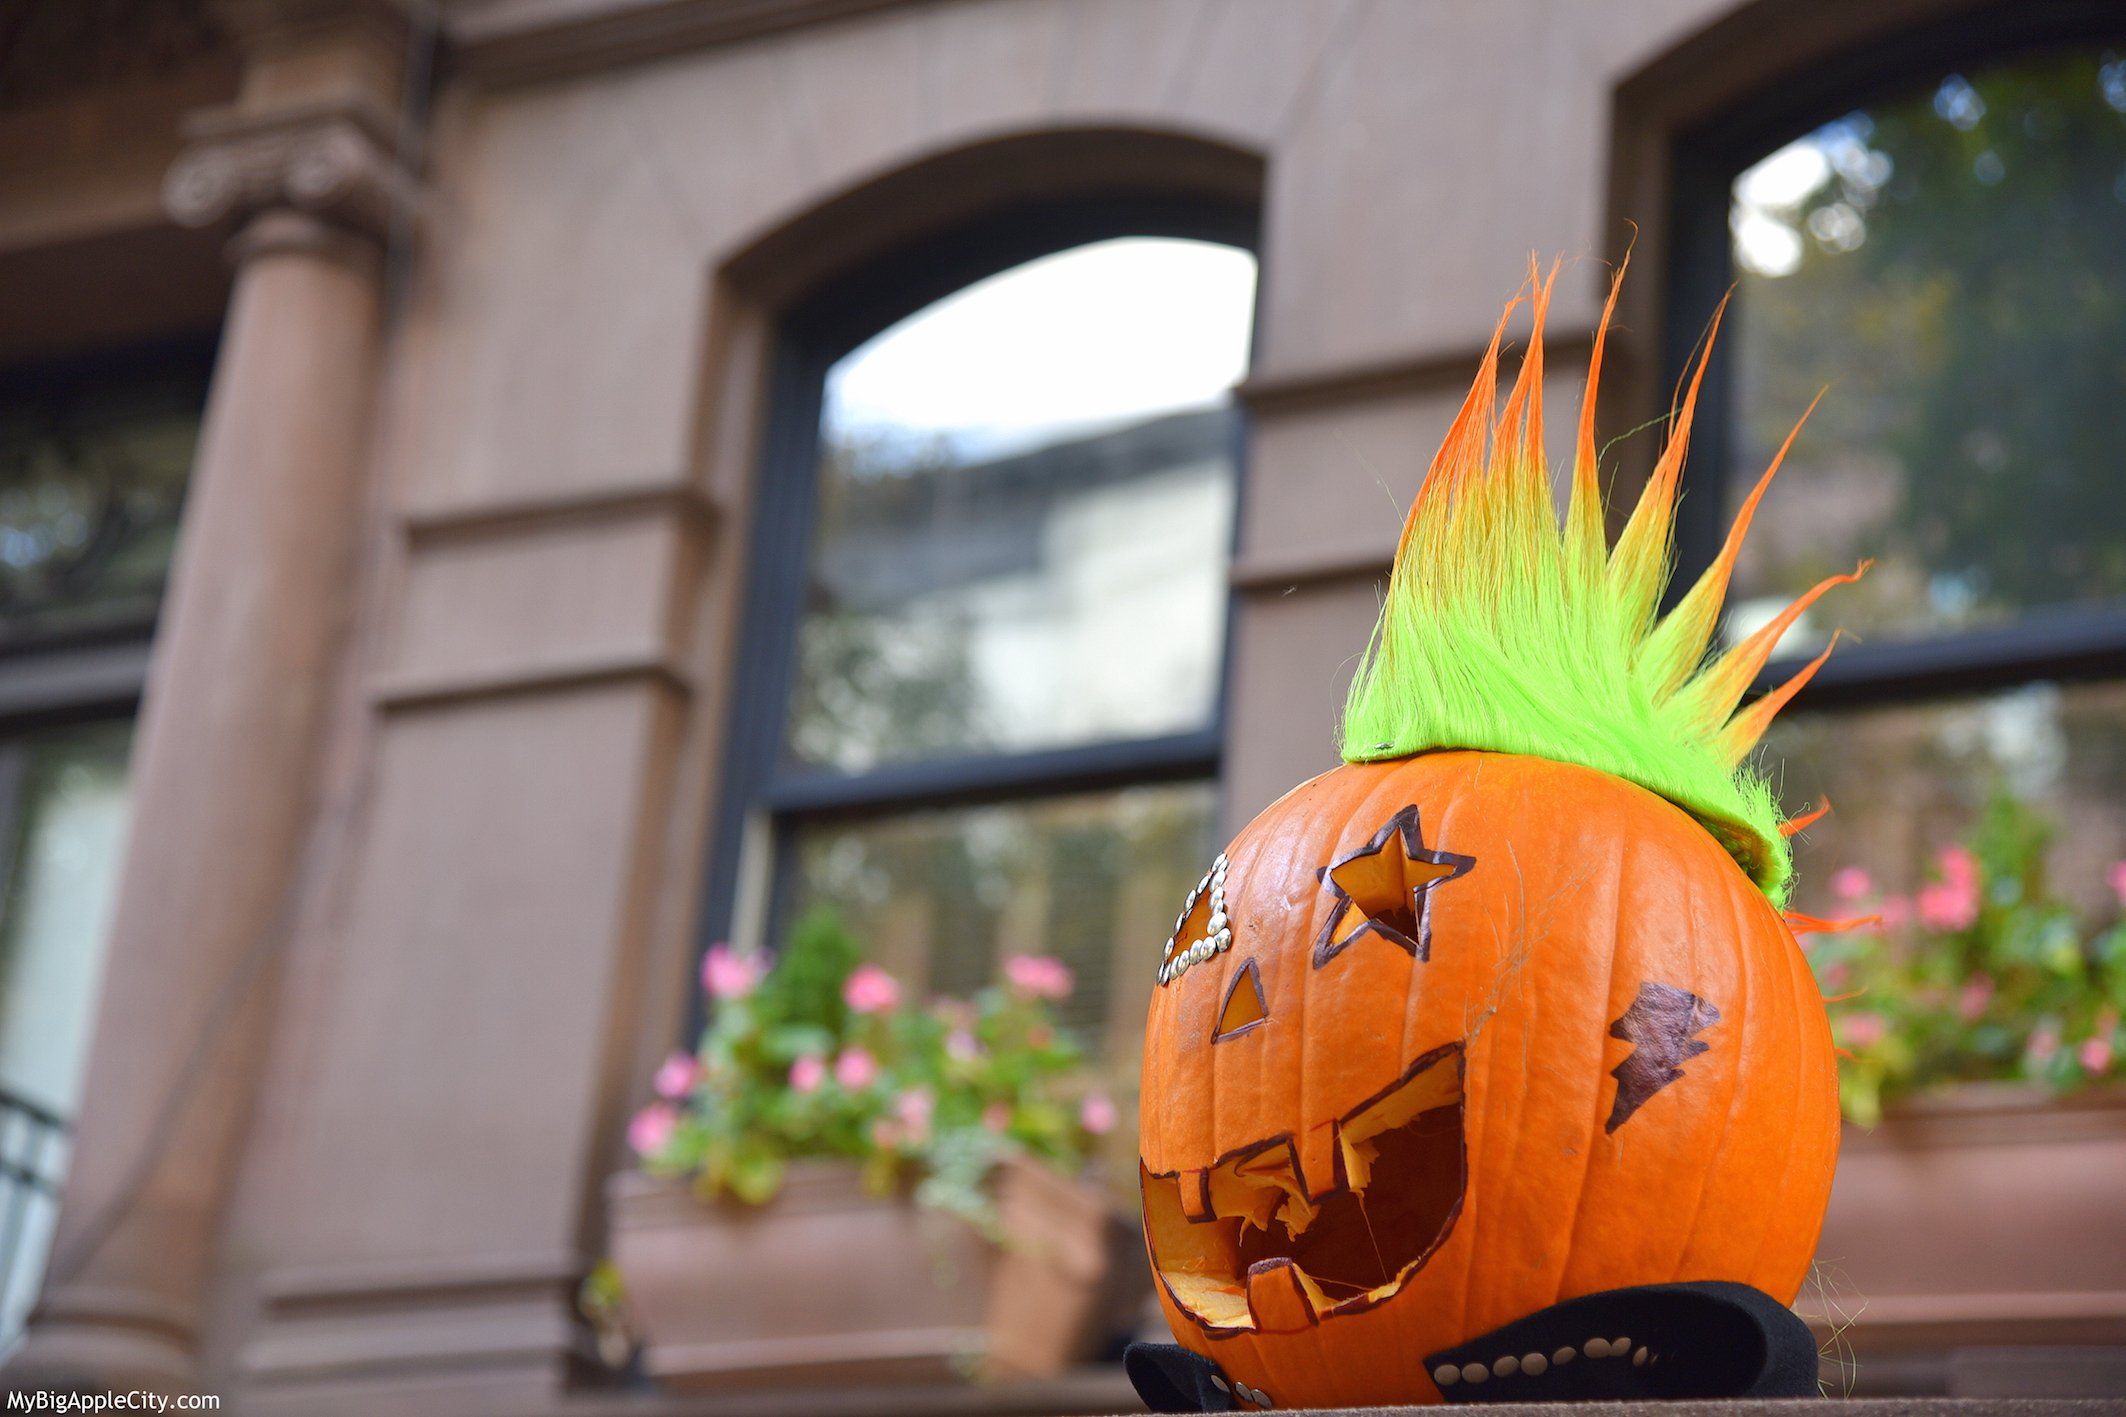 Punk-pumpkin-best-new-york-travel-manhattan-mybigapplecity